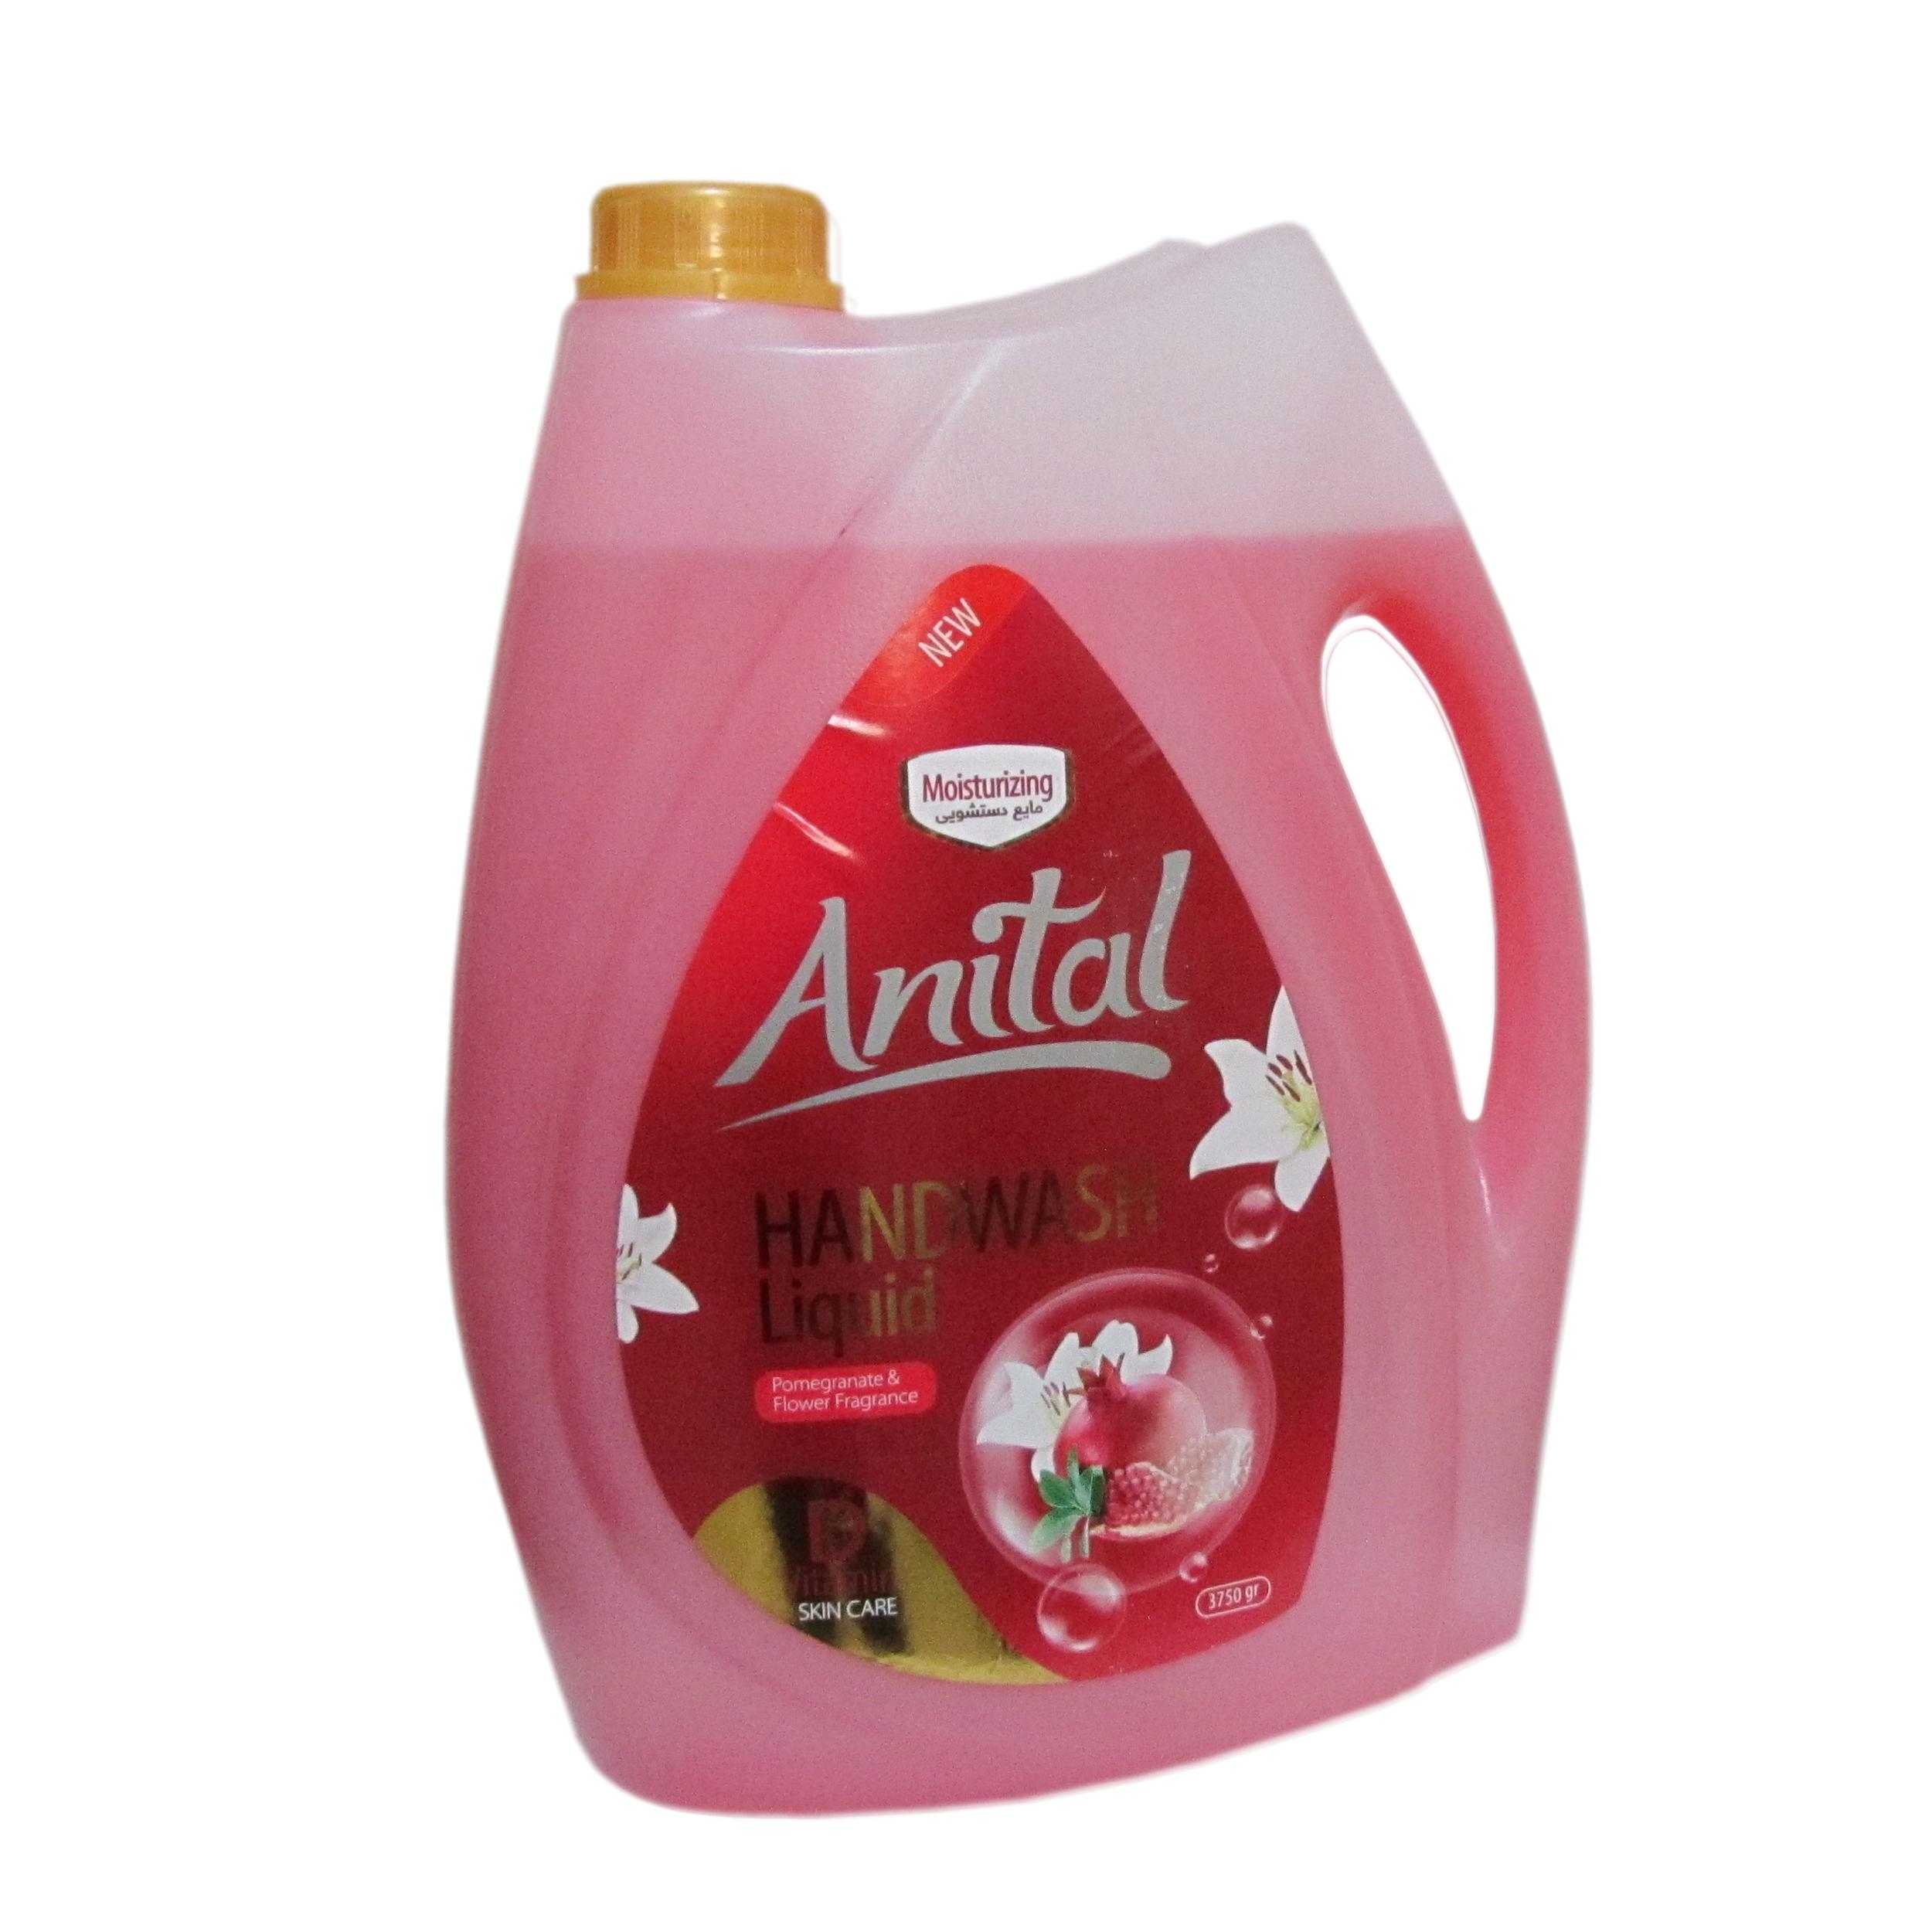 مایع دستشویی آنیتال کد 087 وزن 3750 گرم main 1 2